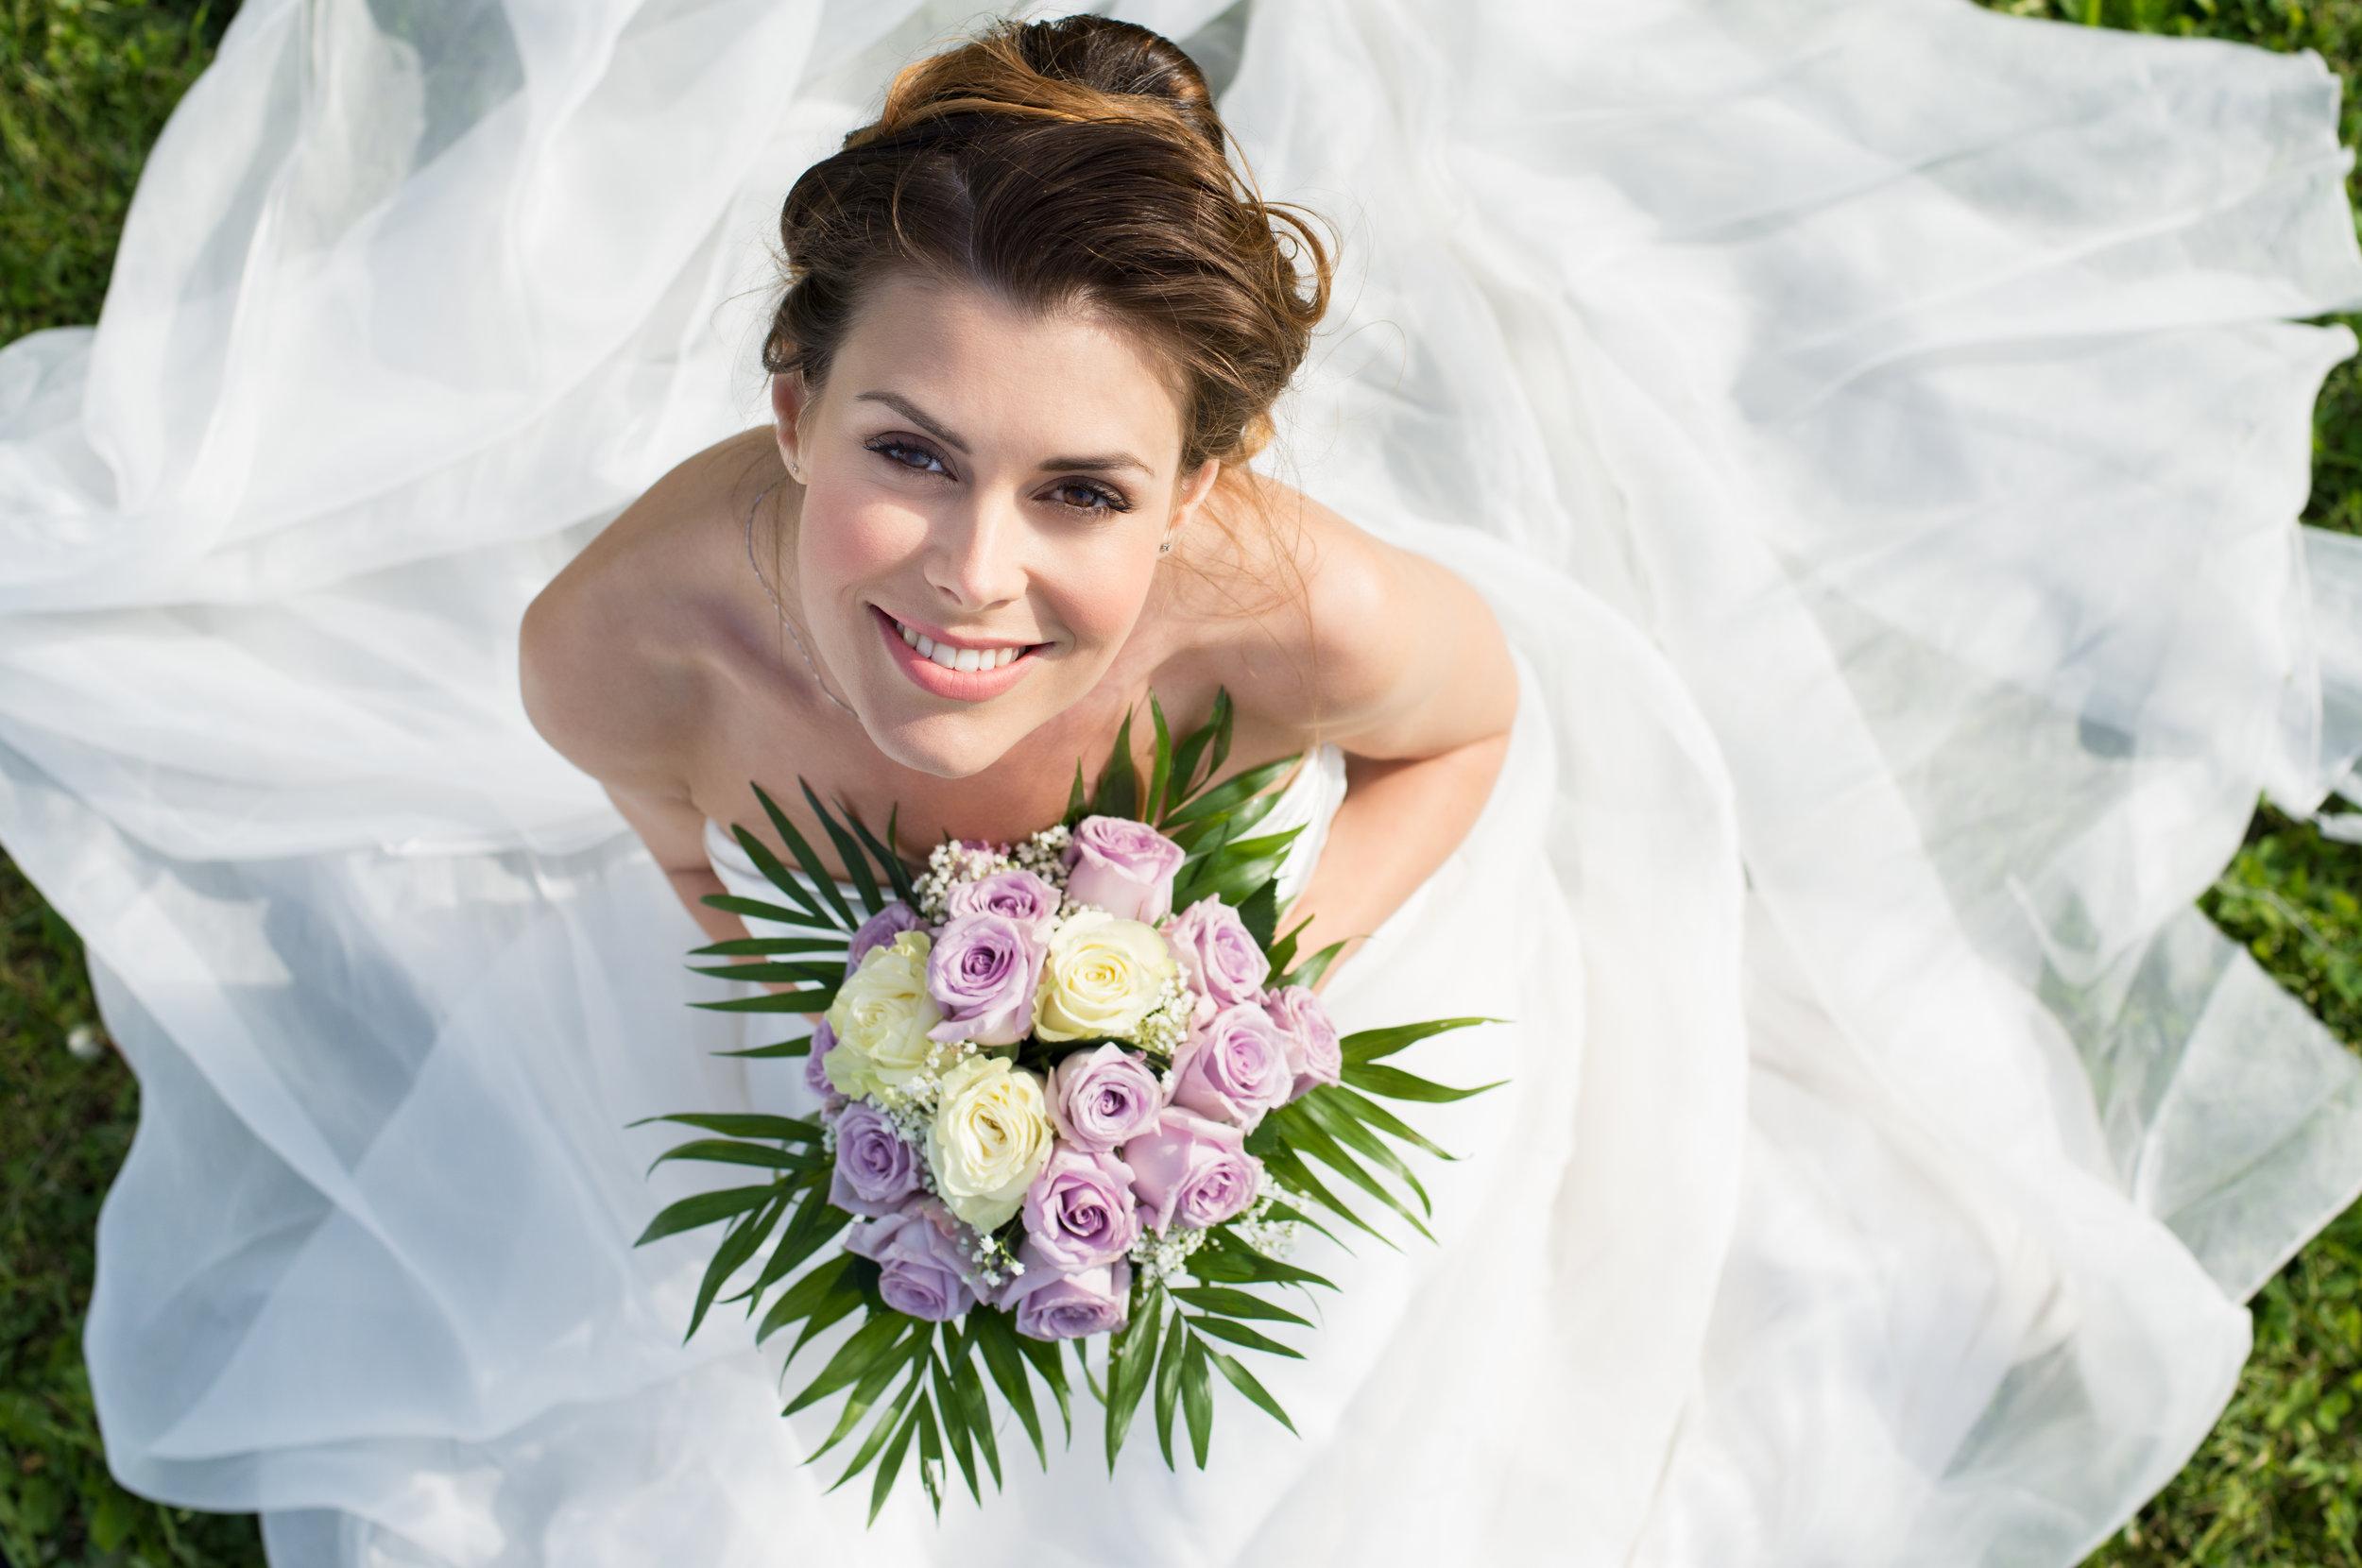 portrait-of-beautiful-bride-PSA4TYT.jpg